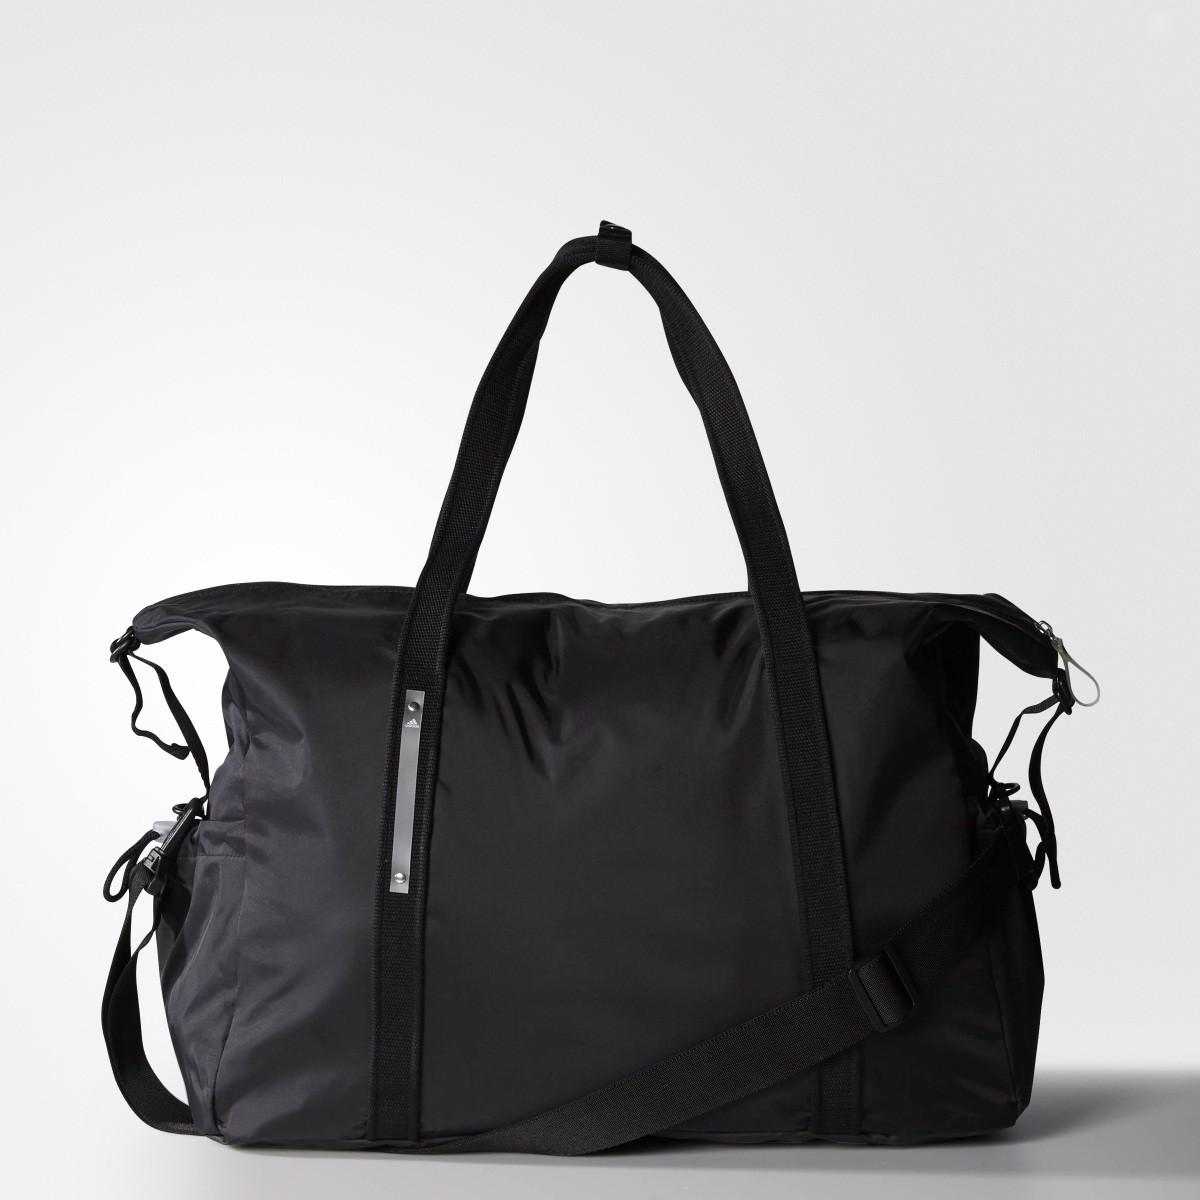 78772ceb89 Pánská taška adidas PERFECT TEAMBAG